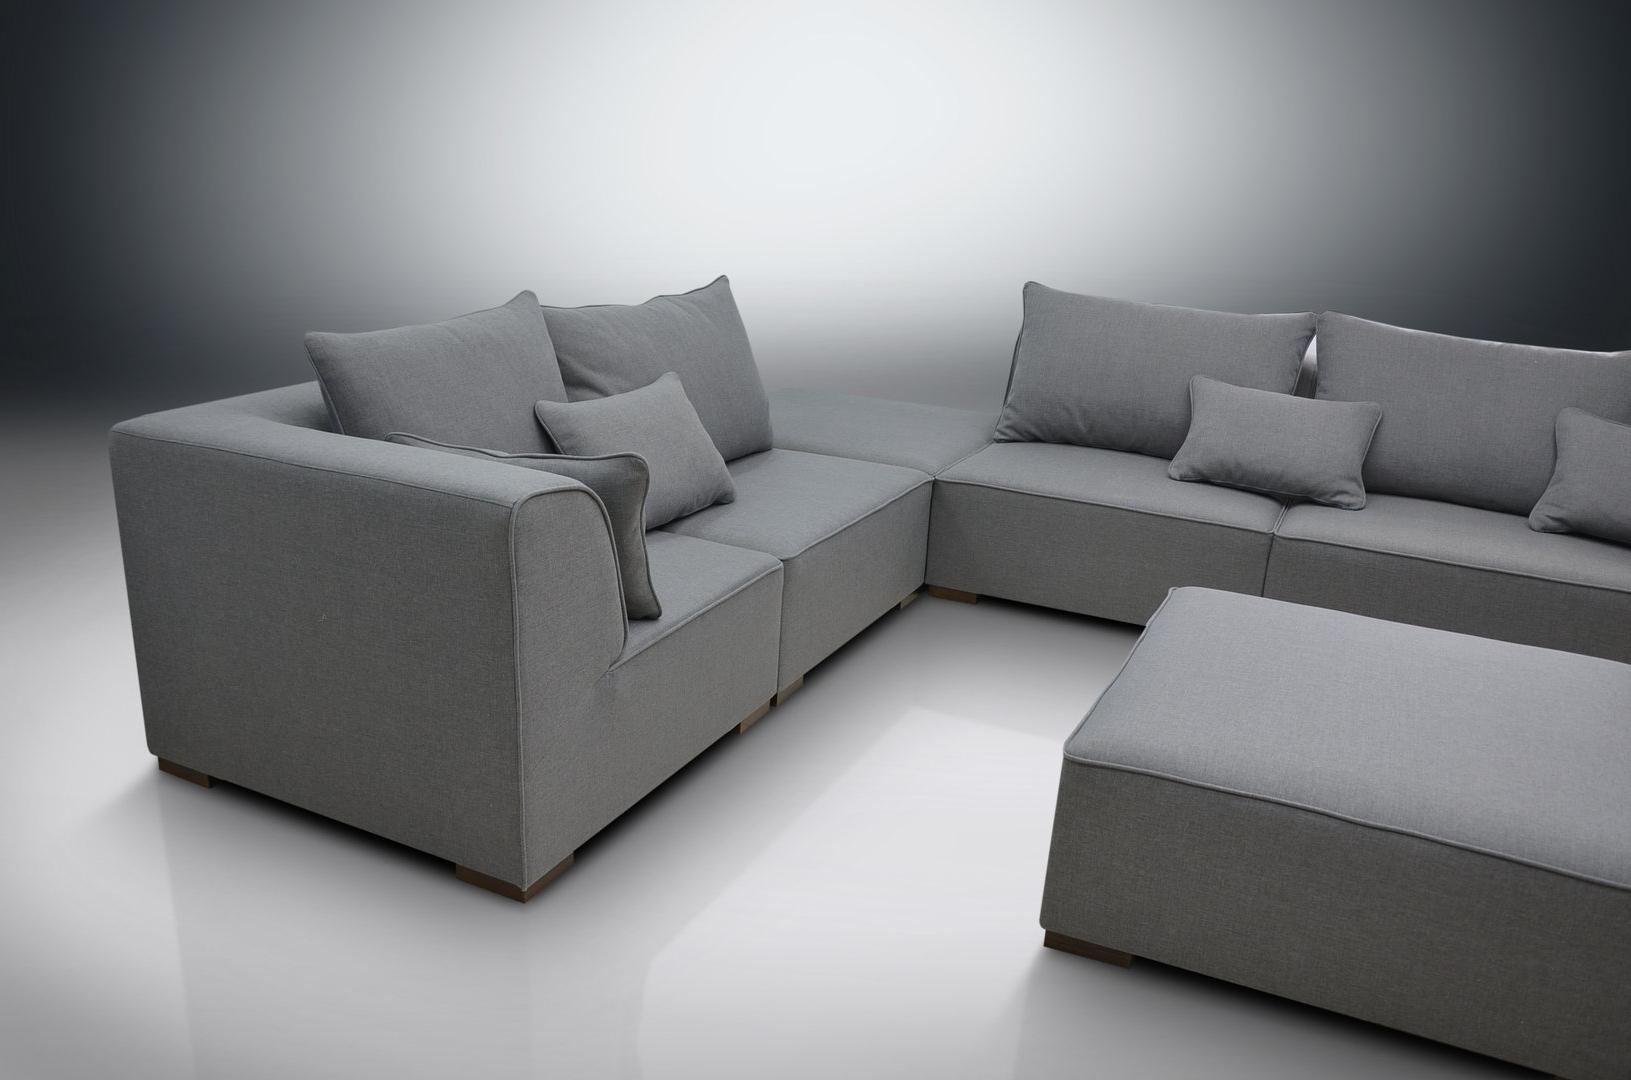 Dream Navy 2 Piece Modular Sofas Inside 2018 Modular Sofa Primo, 2Xcorners, 3Xchairs, 2Xfootstools (View 9 of 15)